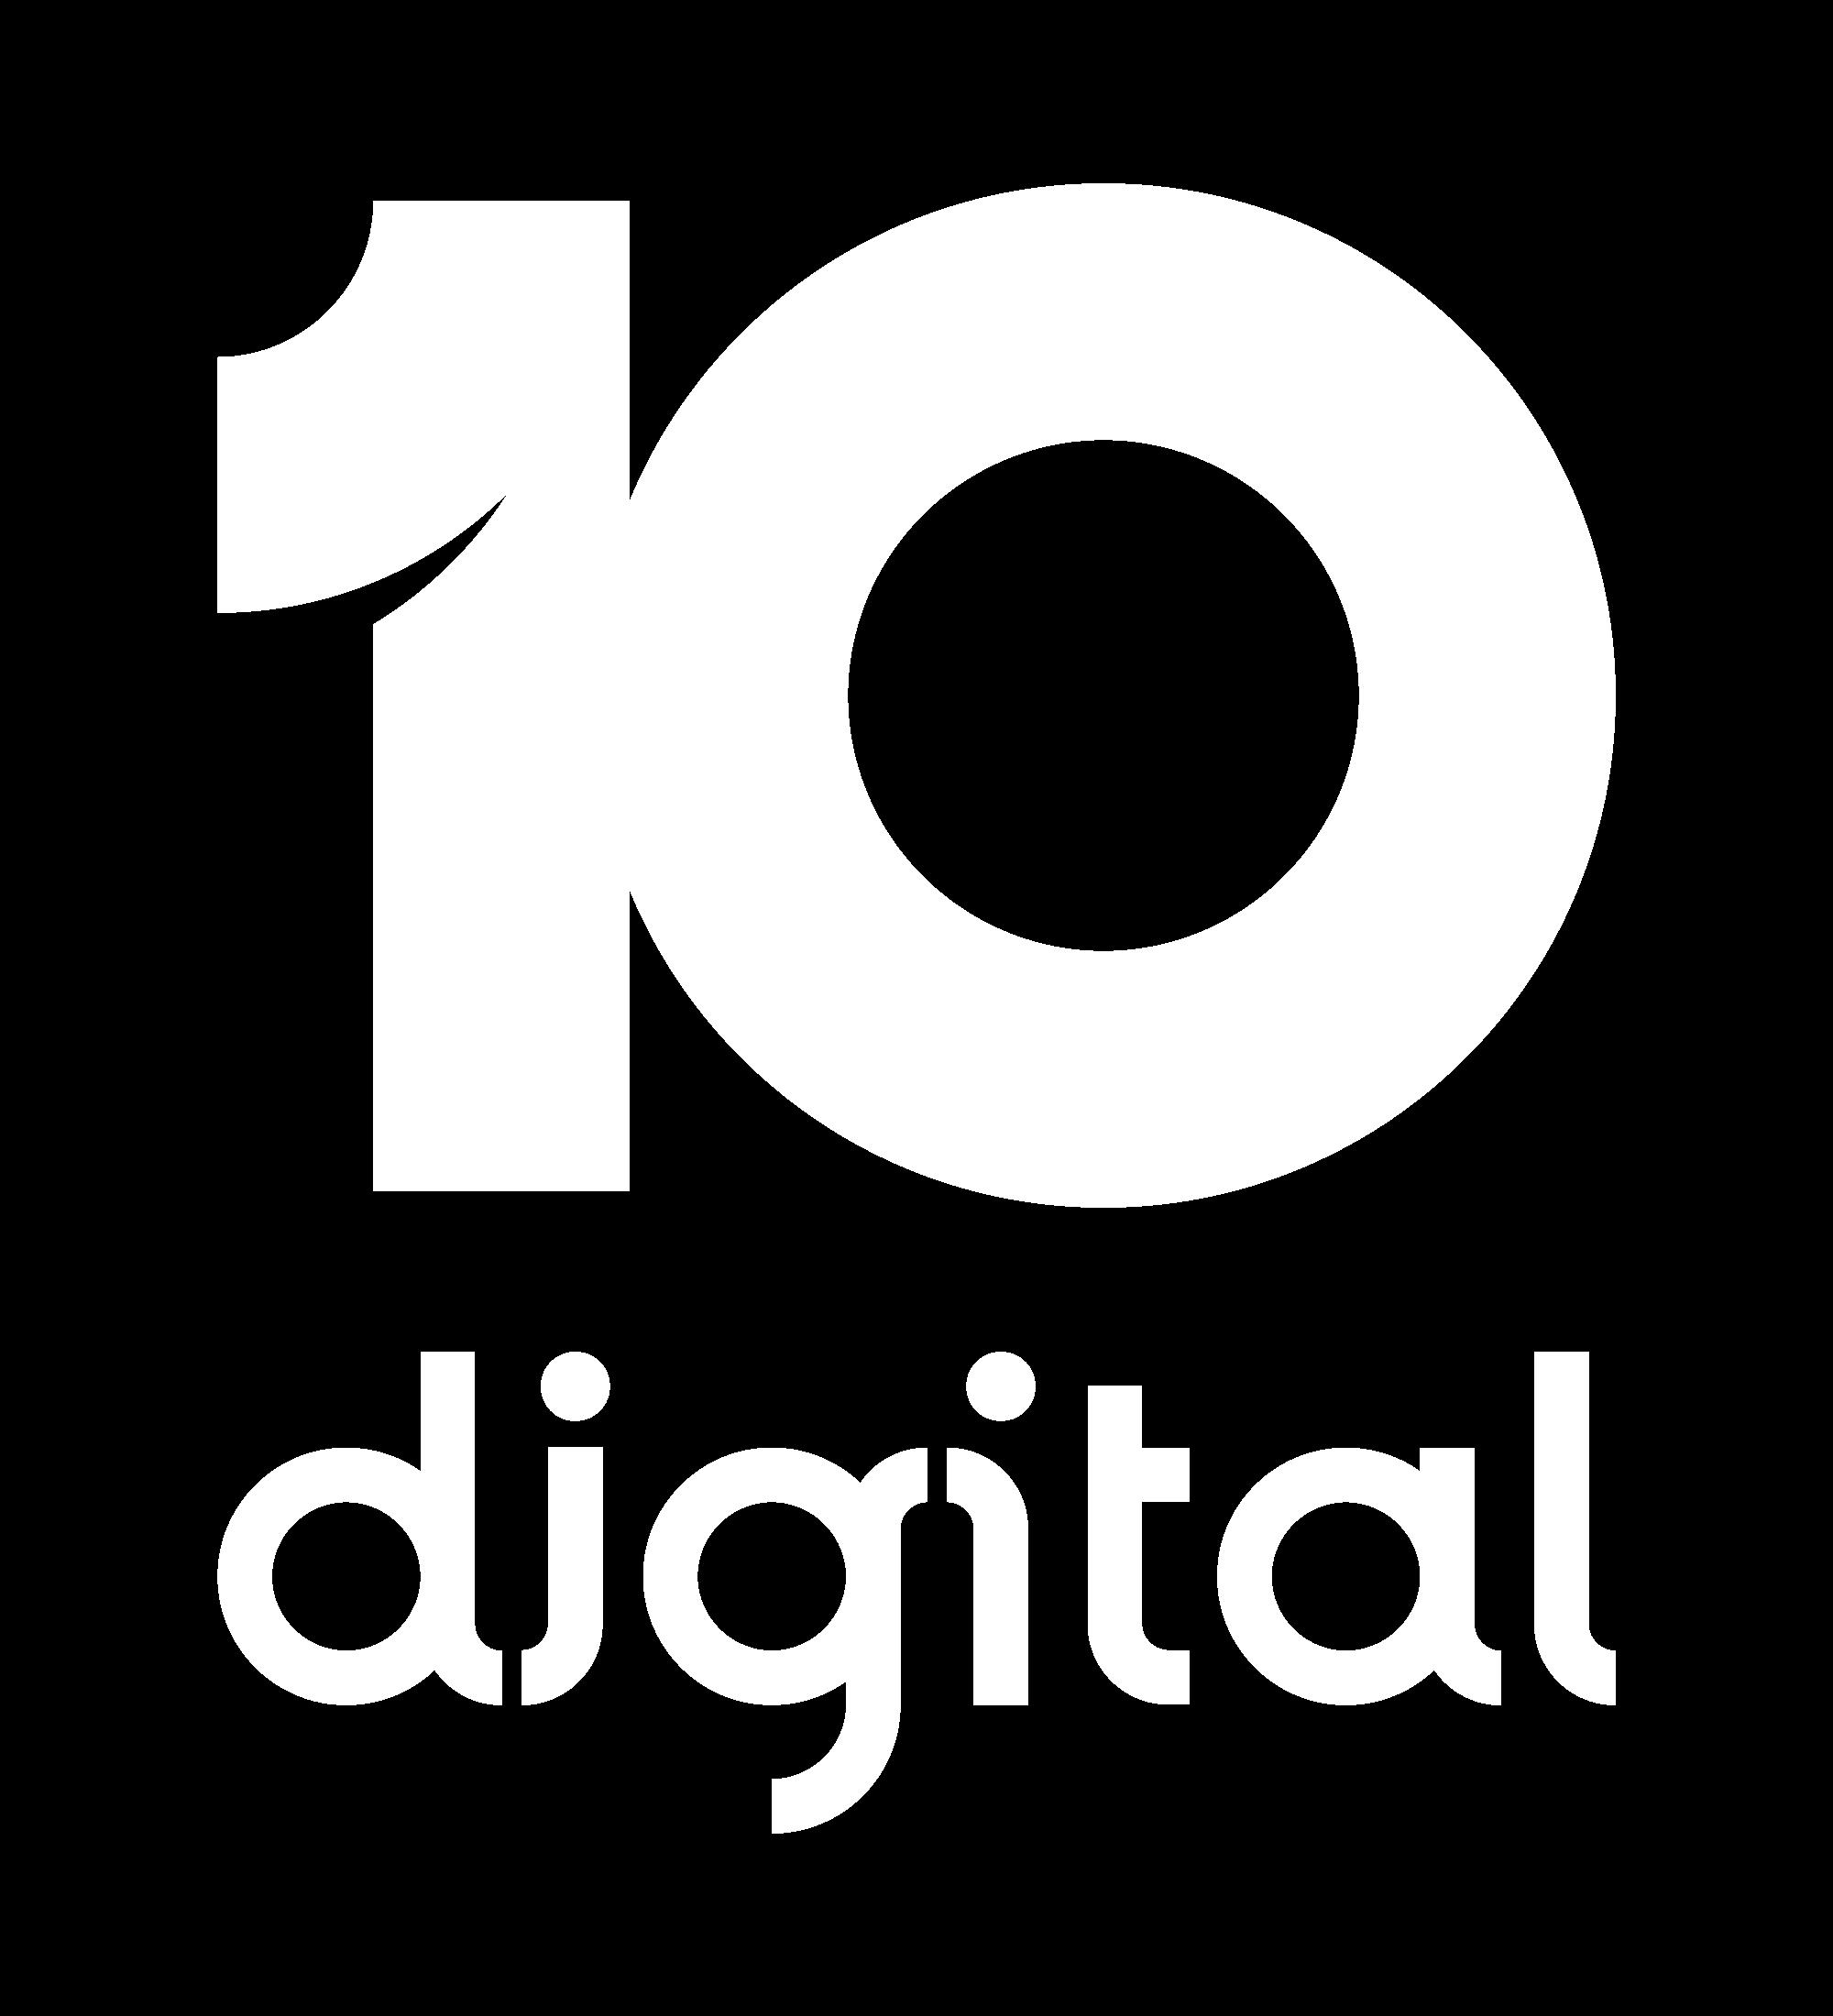 logo 10.digital